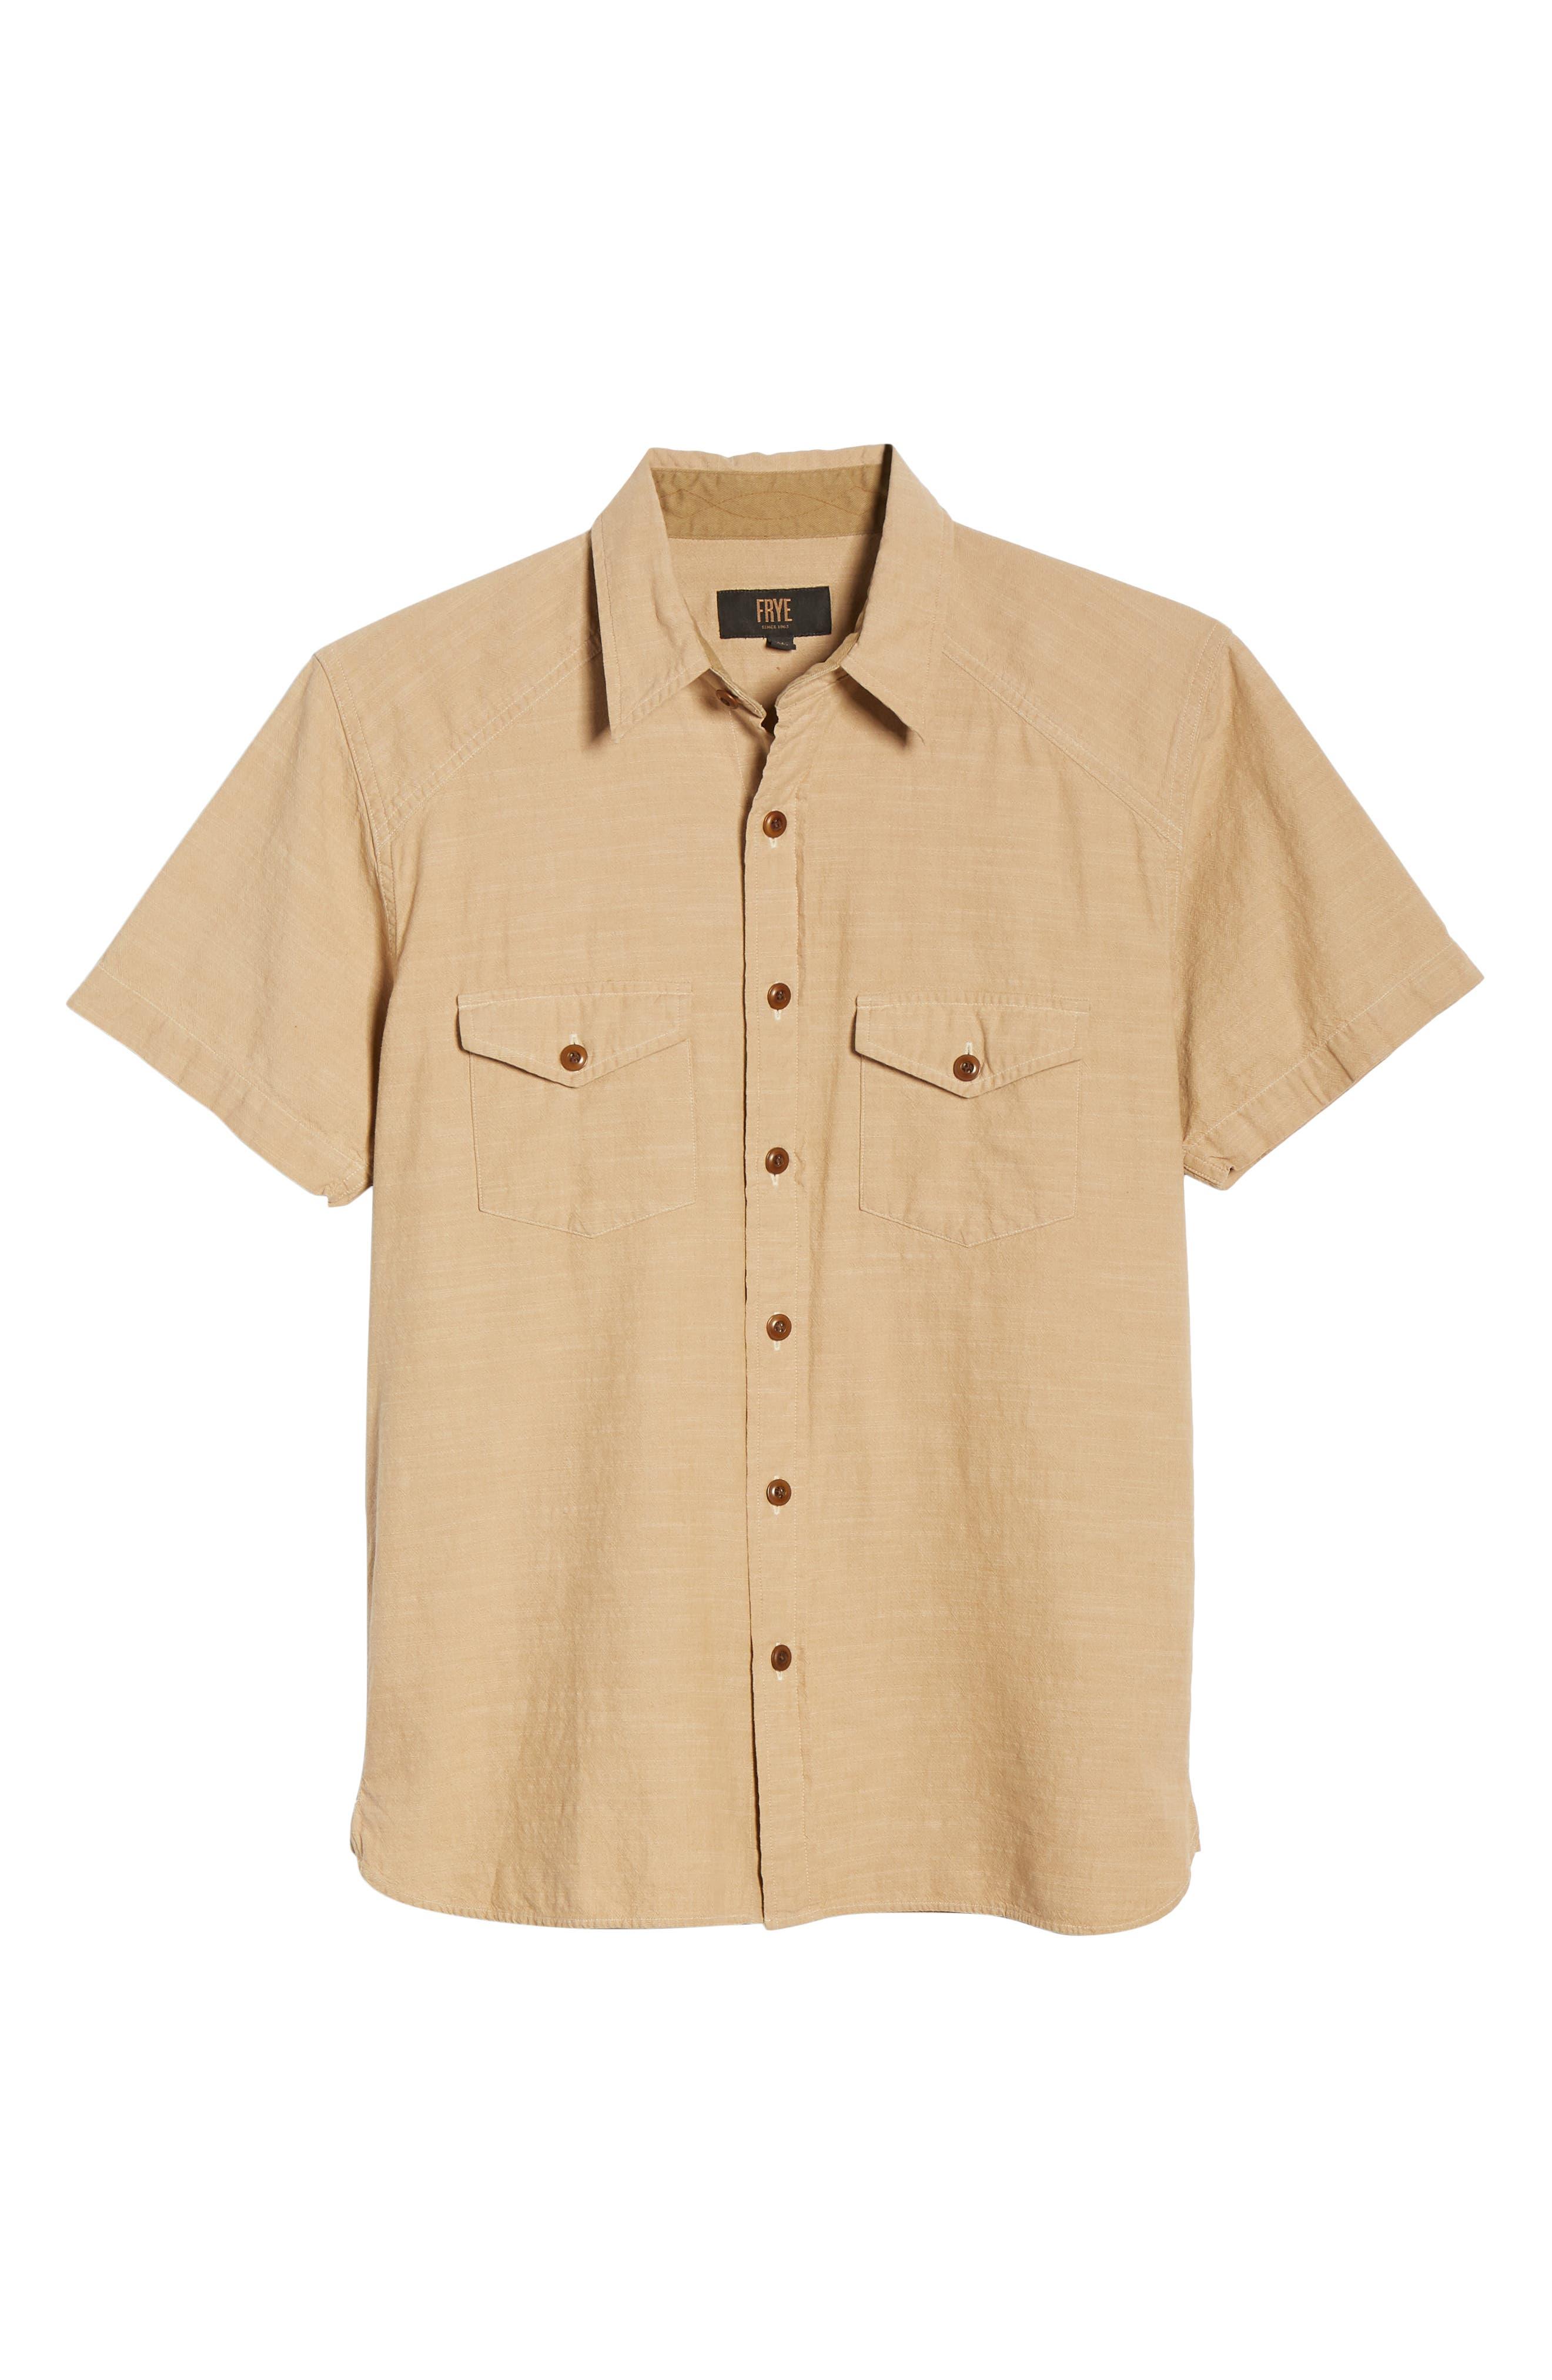 FRYE, Addison Chambray Woven Shirt, Alternate thumbnail 5, color, KRAFT BROWN